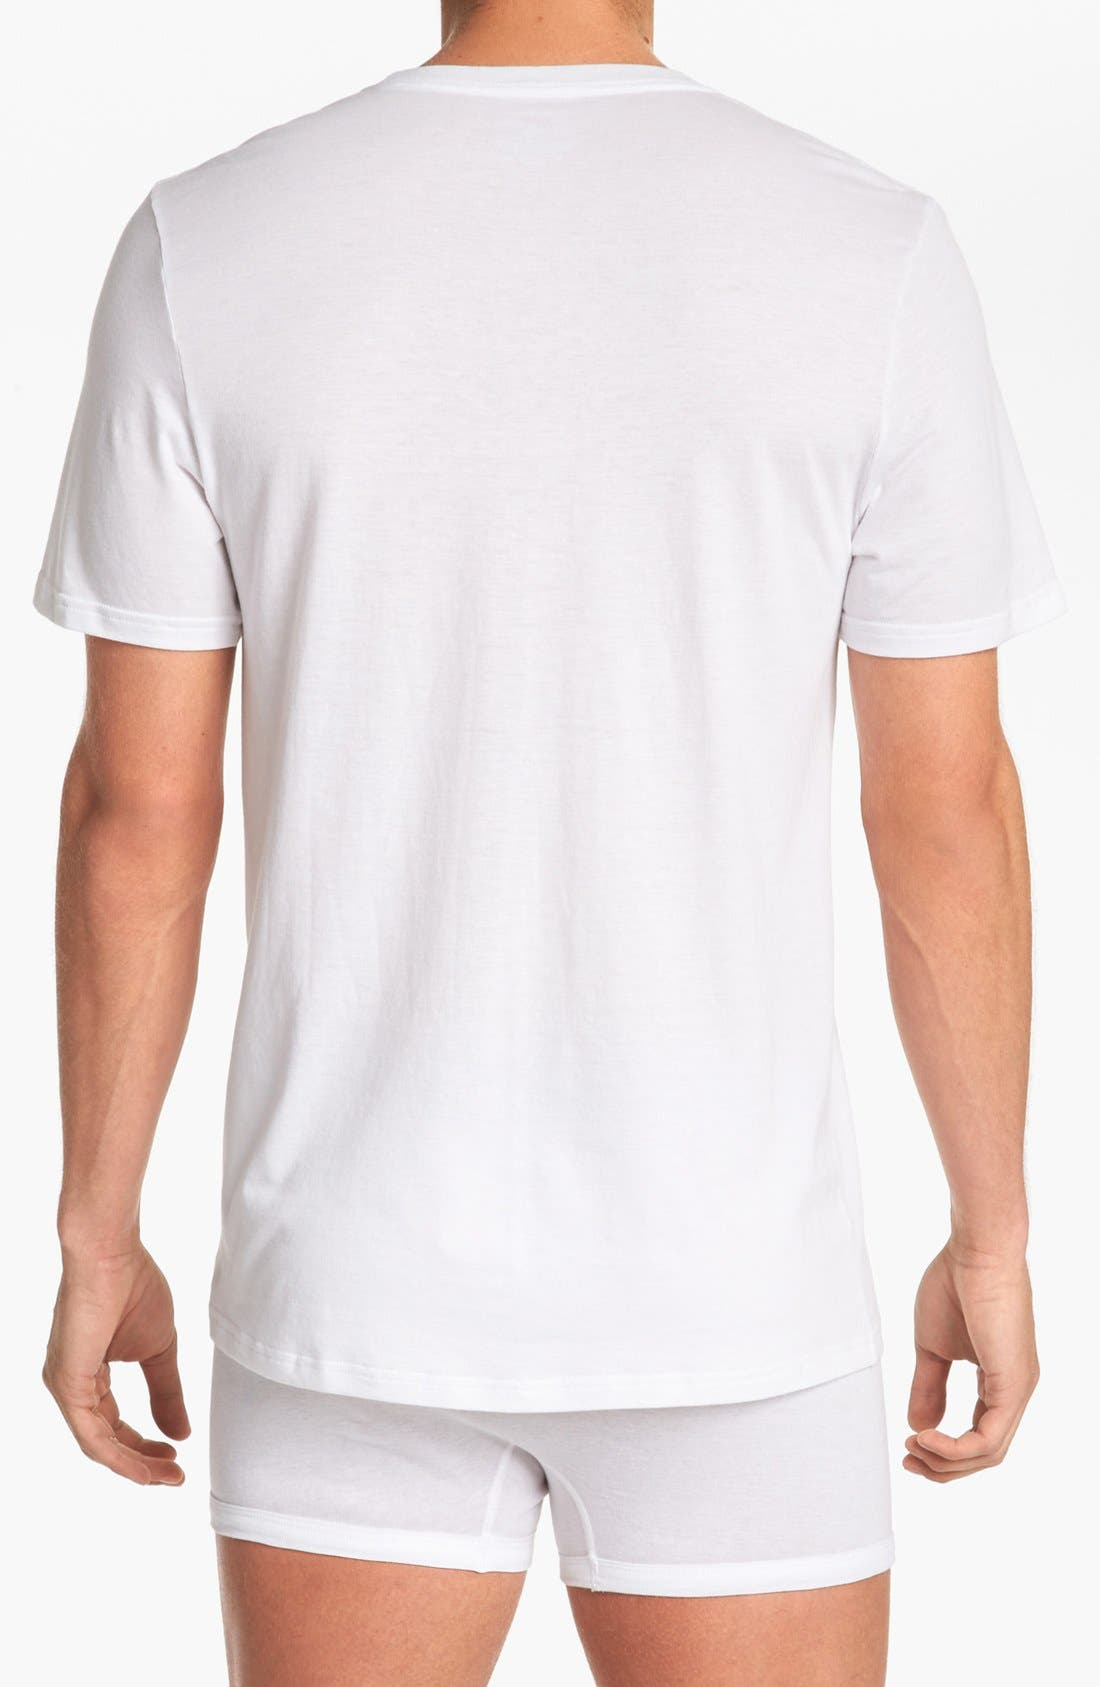 Alternate Image 2  - Michael Kors 'Soft Touch' Crewneck T-Shirt (3-Pack)